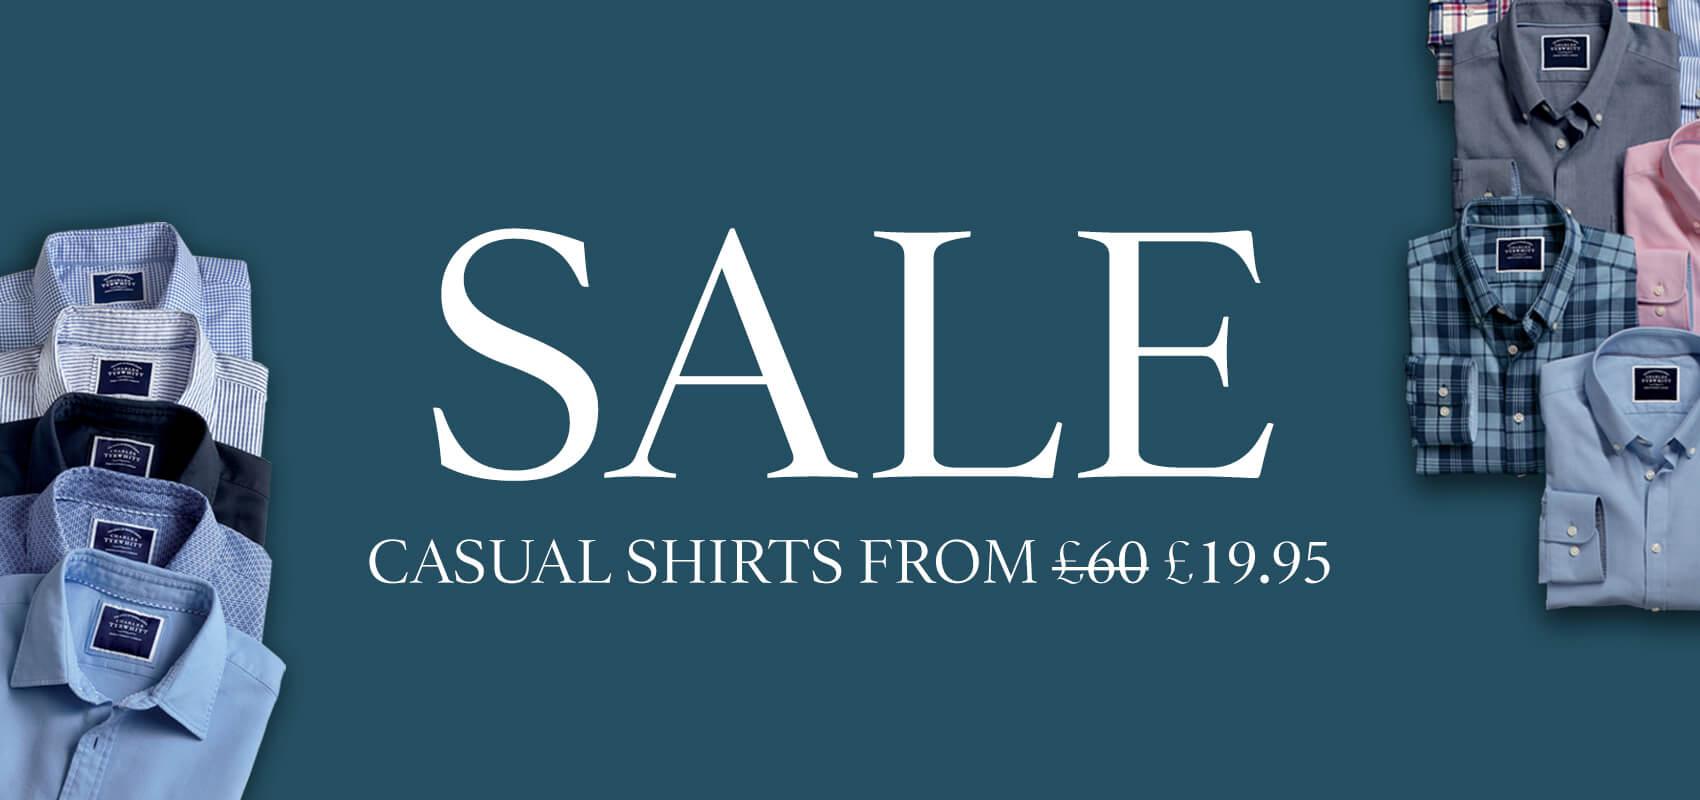 charles tyrwhitt casual shirts review